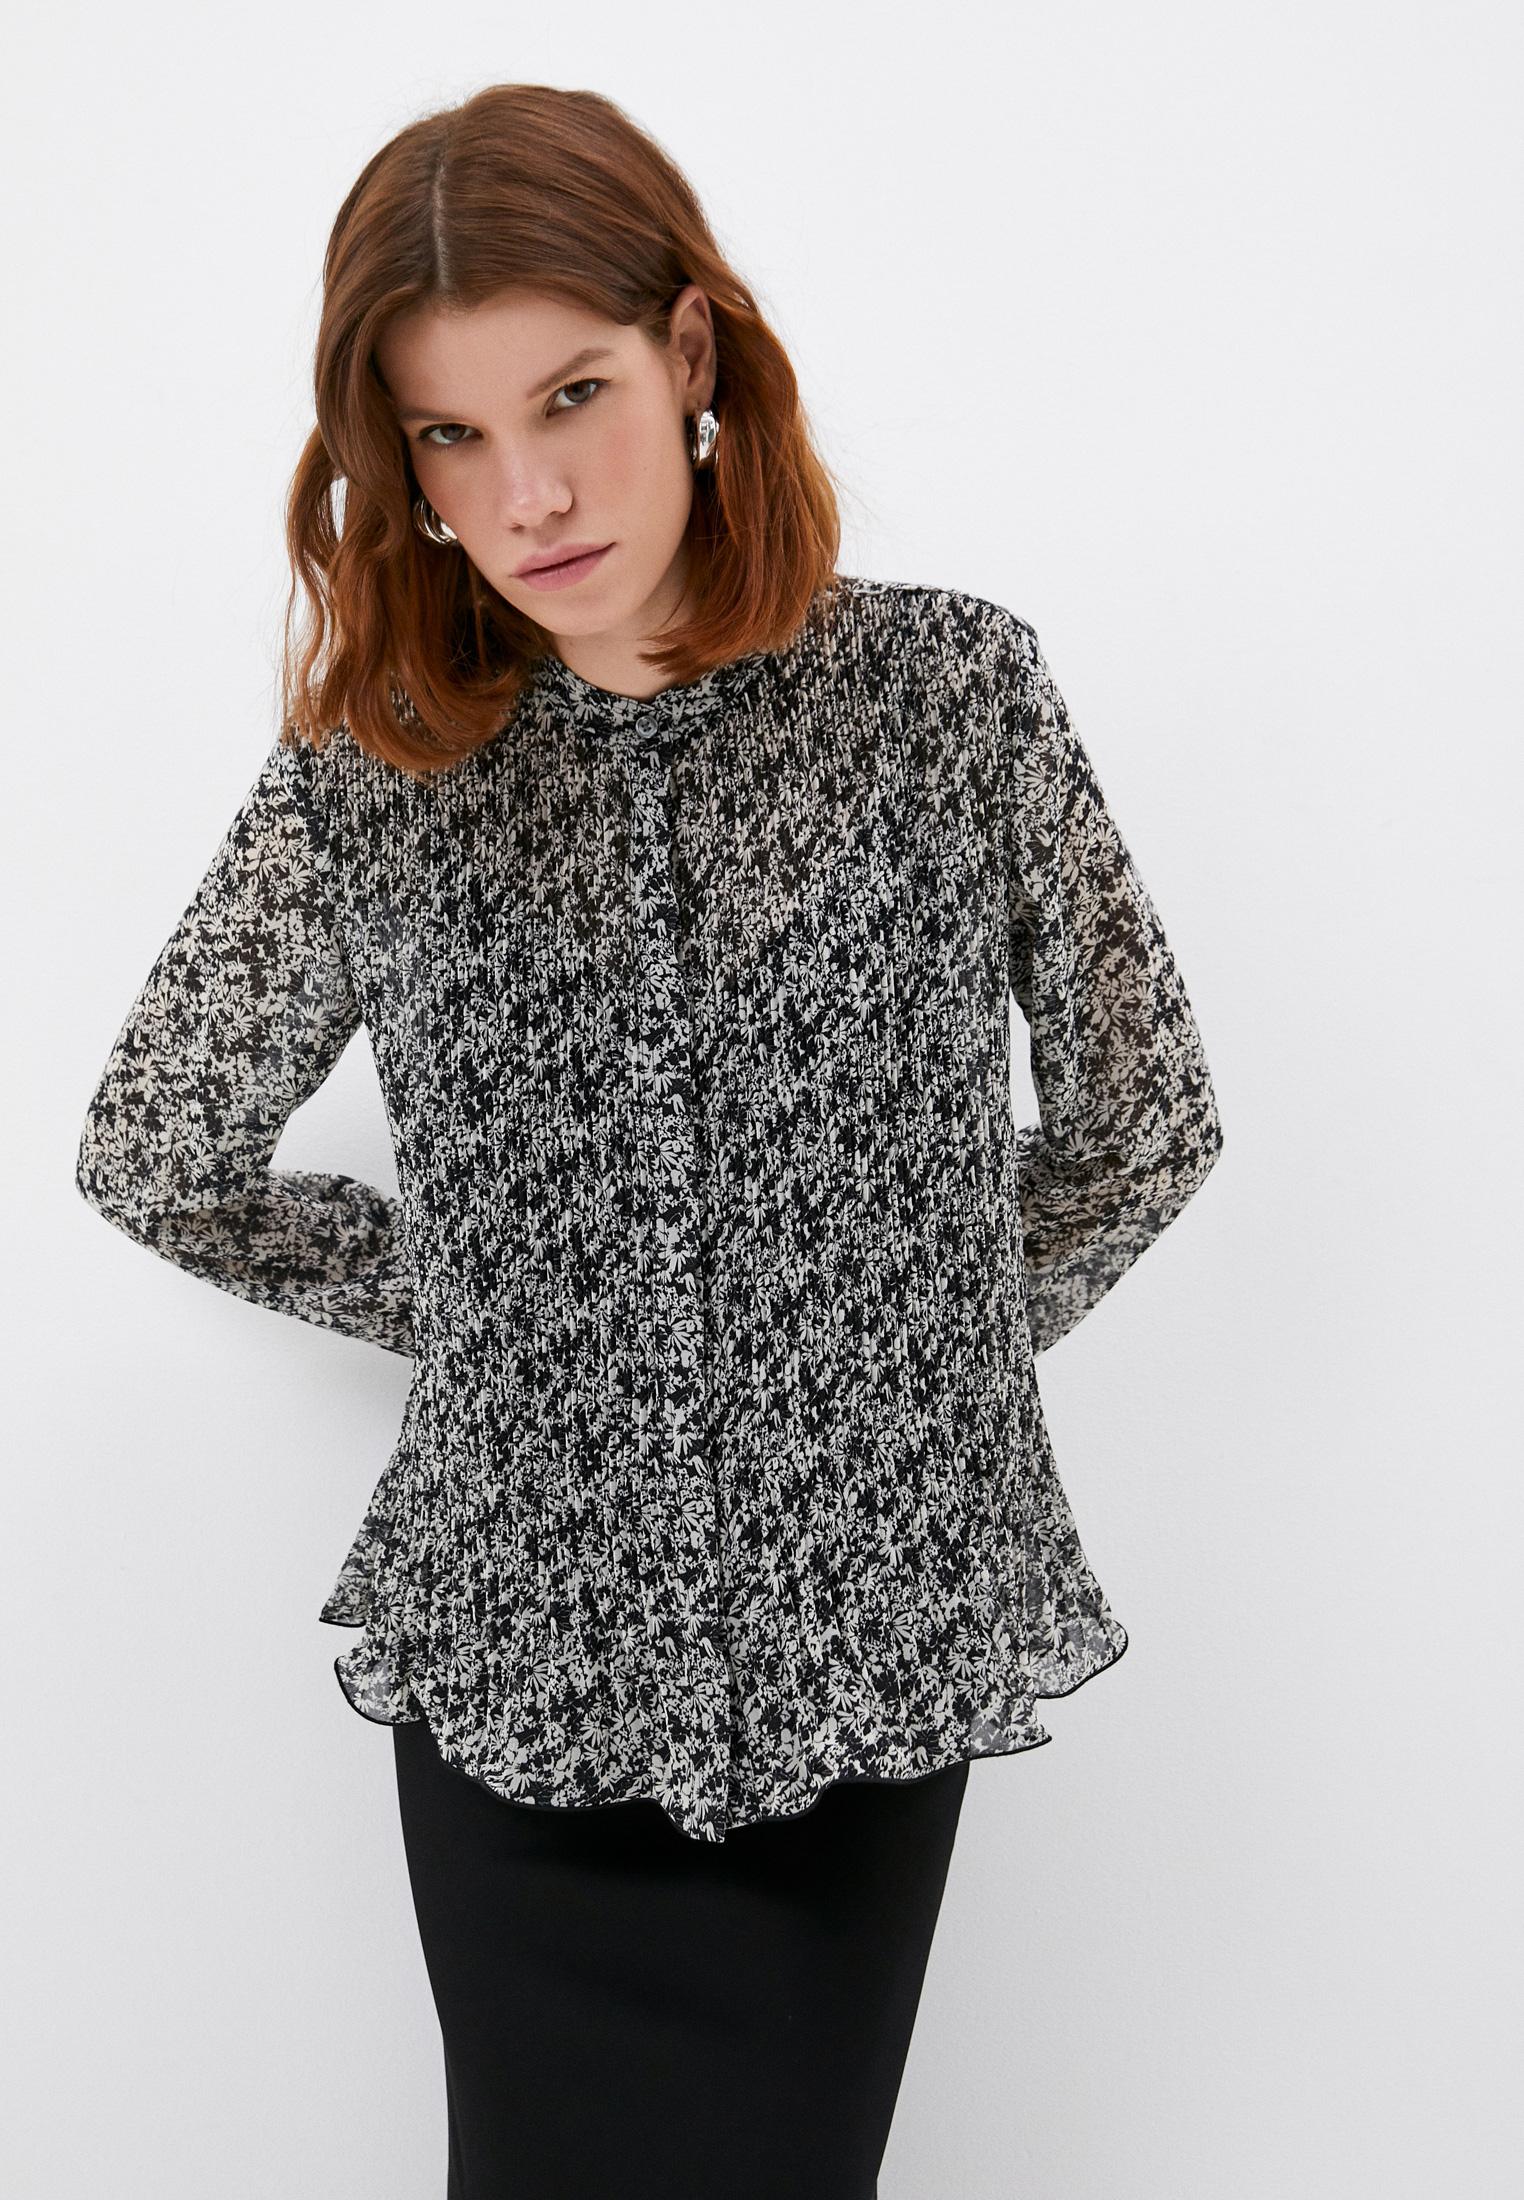 Блуза Calvin Klein (Кельвин Кляйн) Блуза Calvin Klein